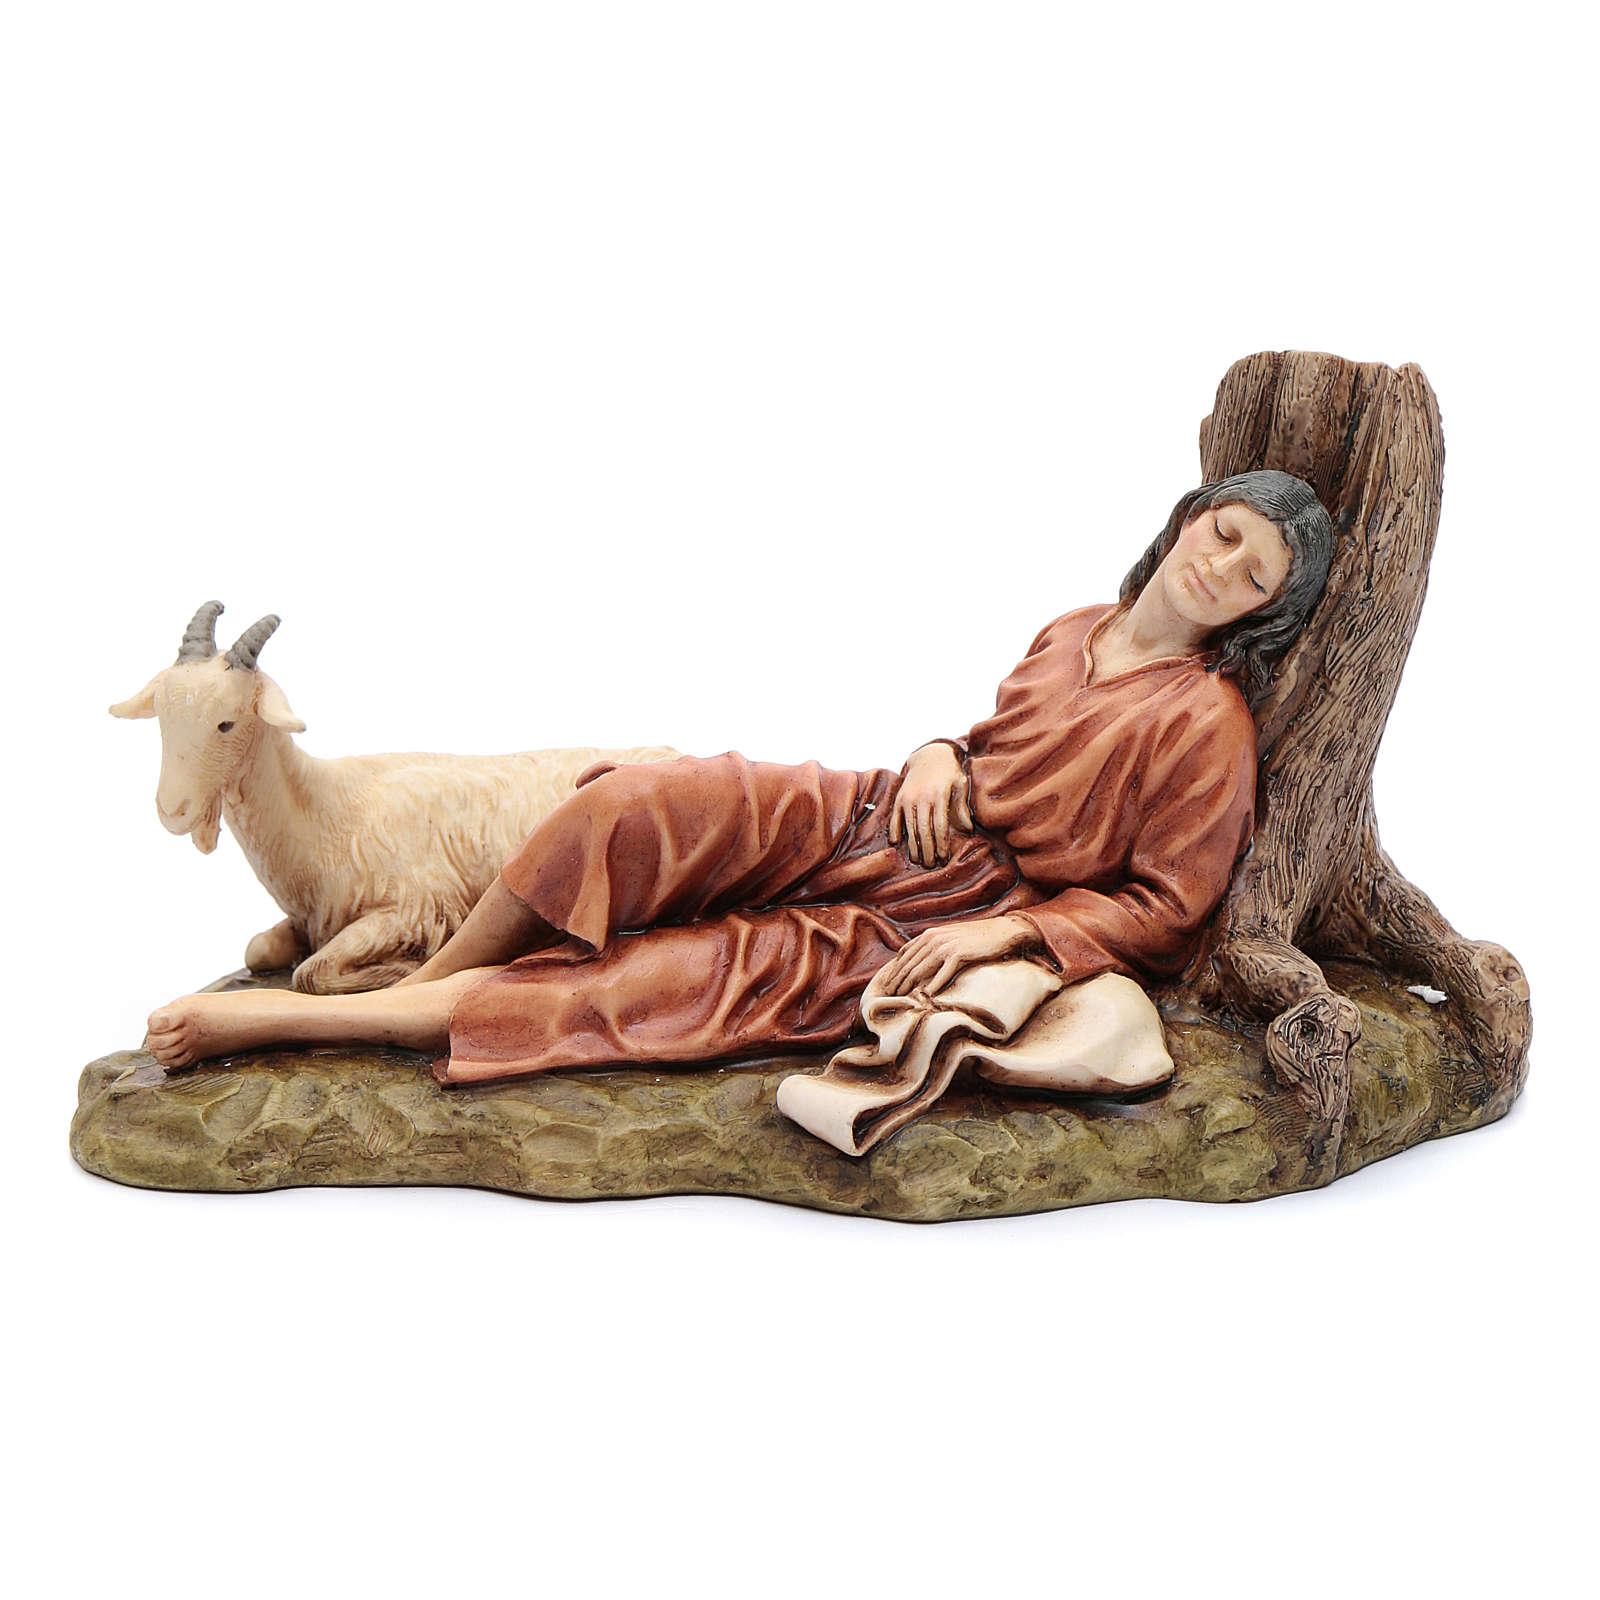 Dormente con capra 15 cm resina Moranduzzo 4